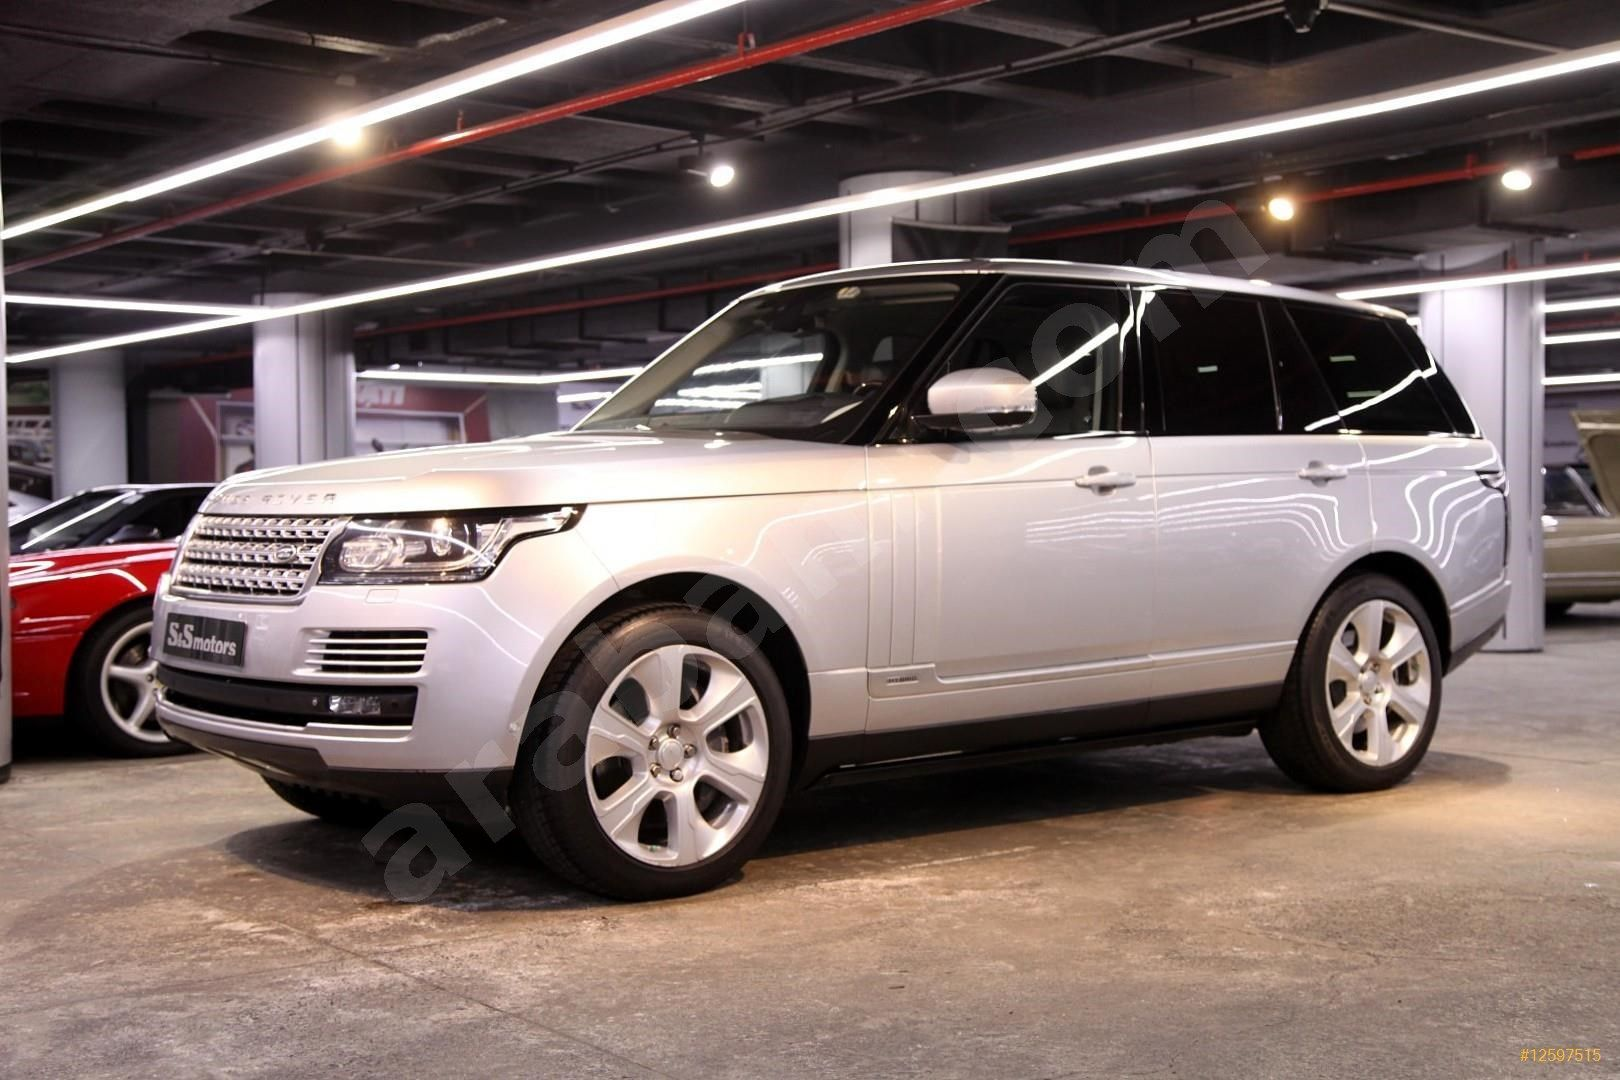 Land Rover Range Rover 3.0 SDV6 Vogue Hybrid Range rover